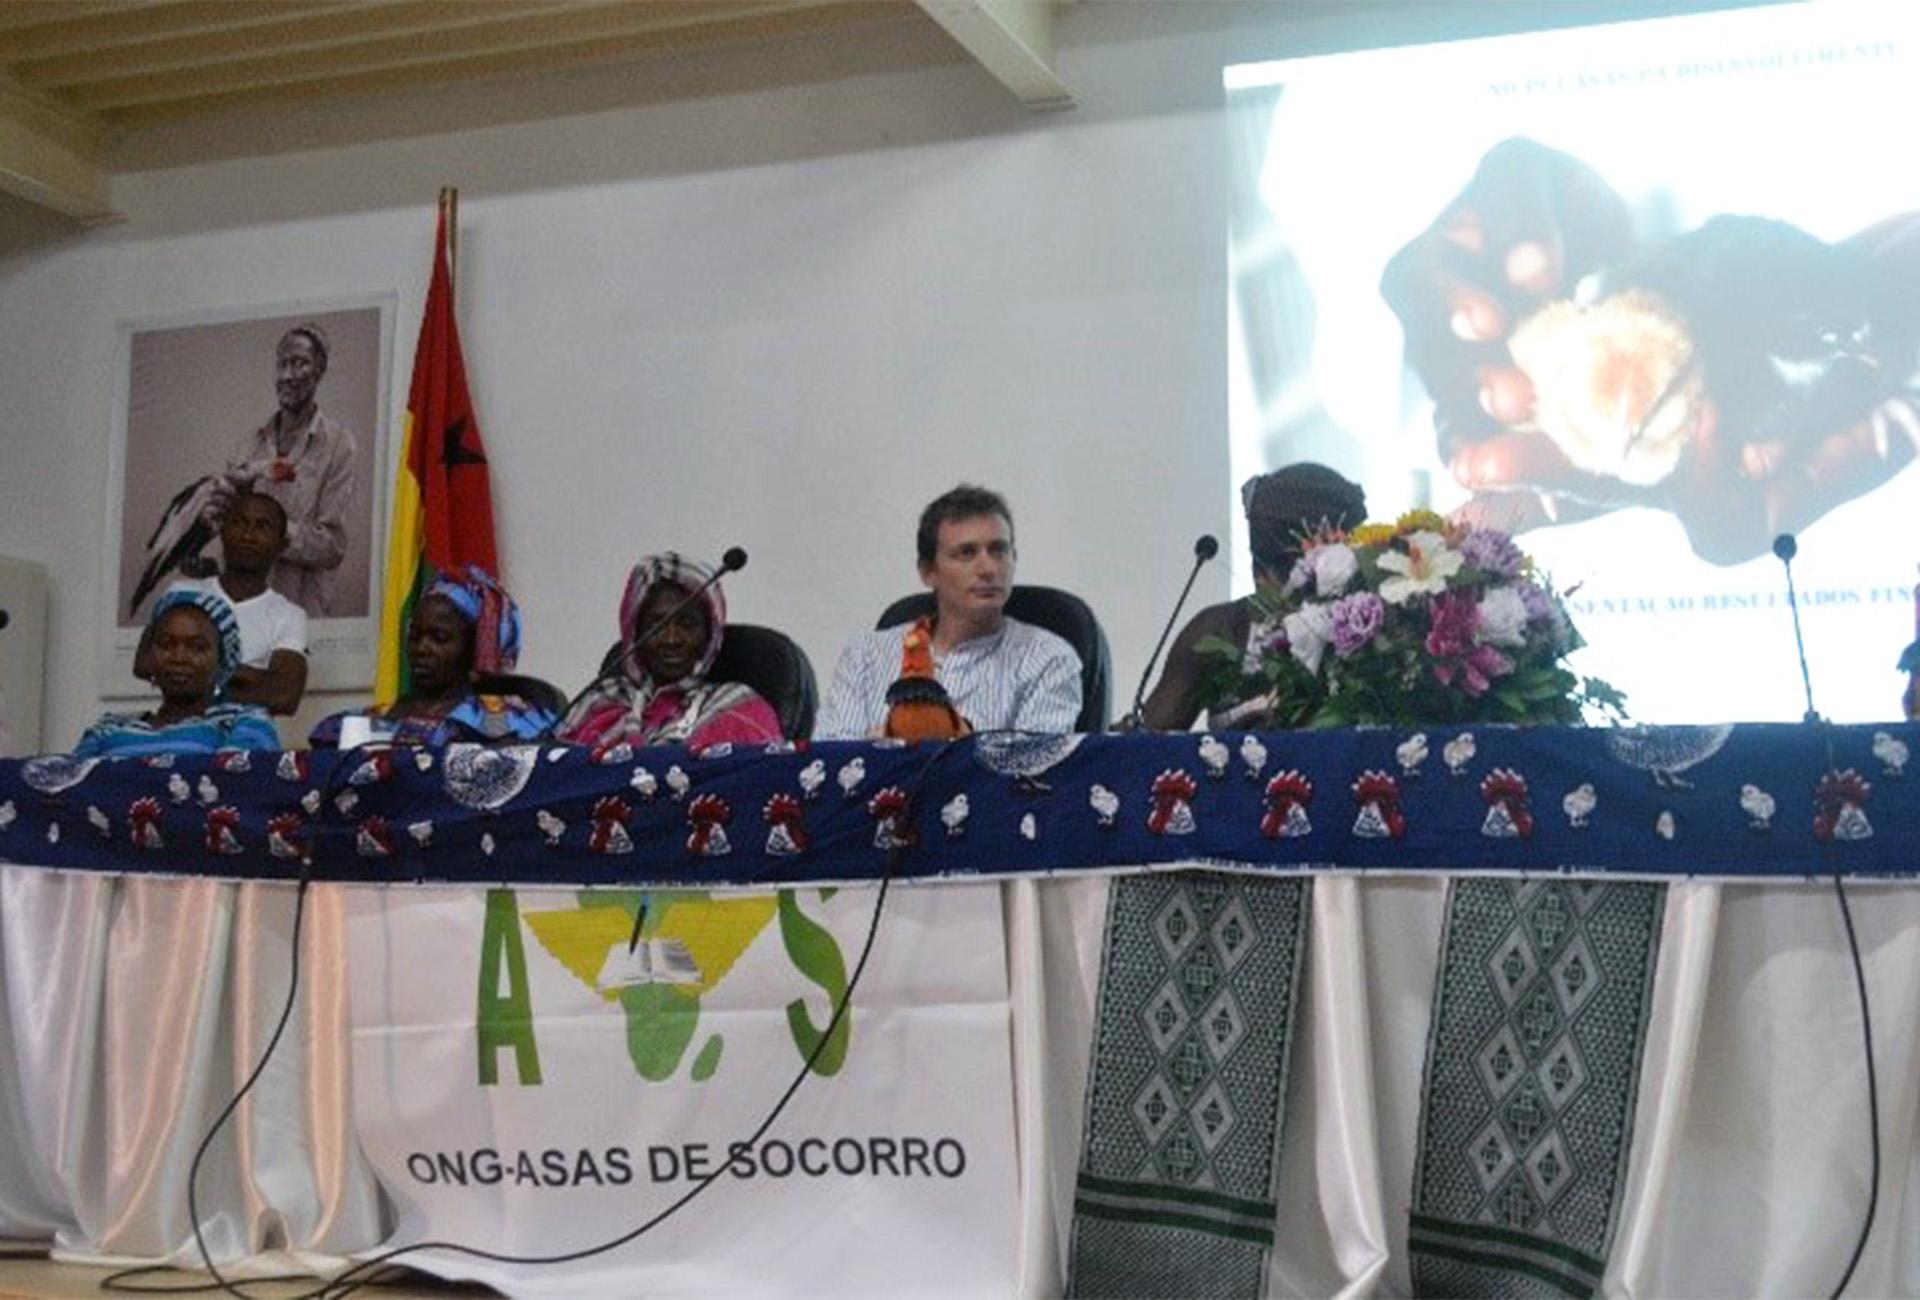 presentazione risultati avicoltura donne Guinea Bissau Mani Tese 2018